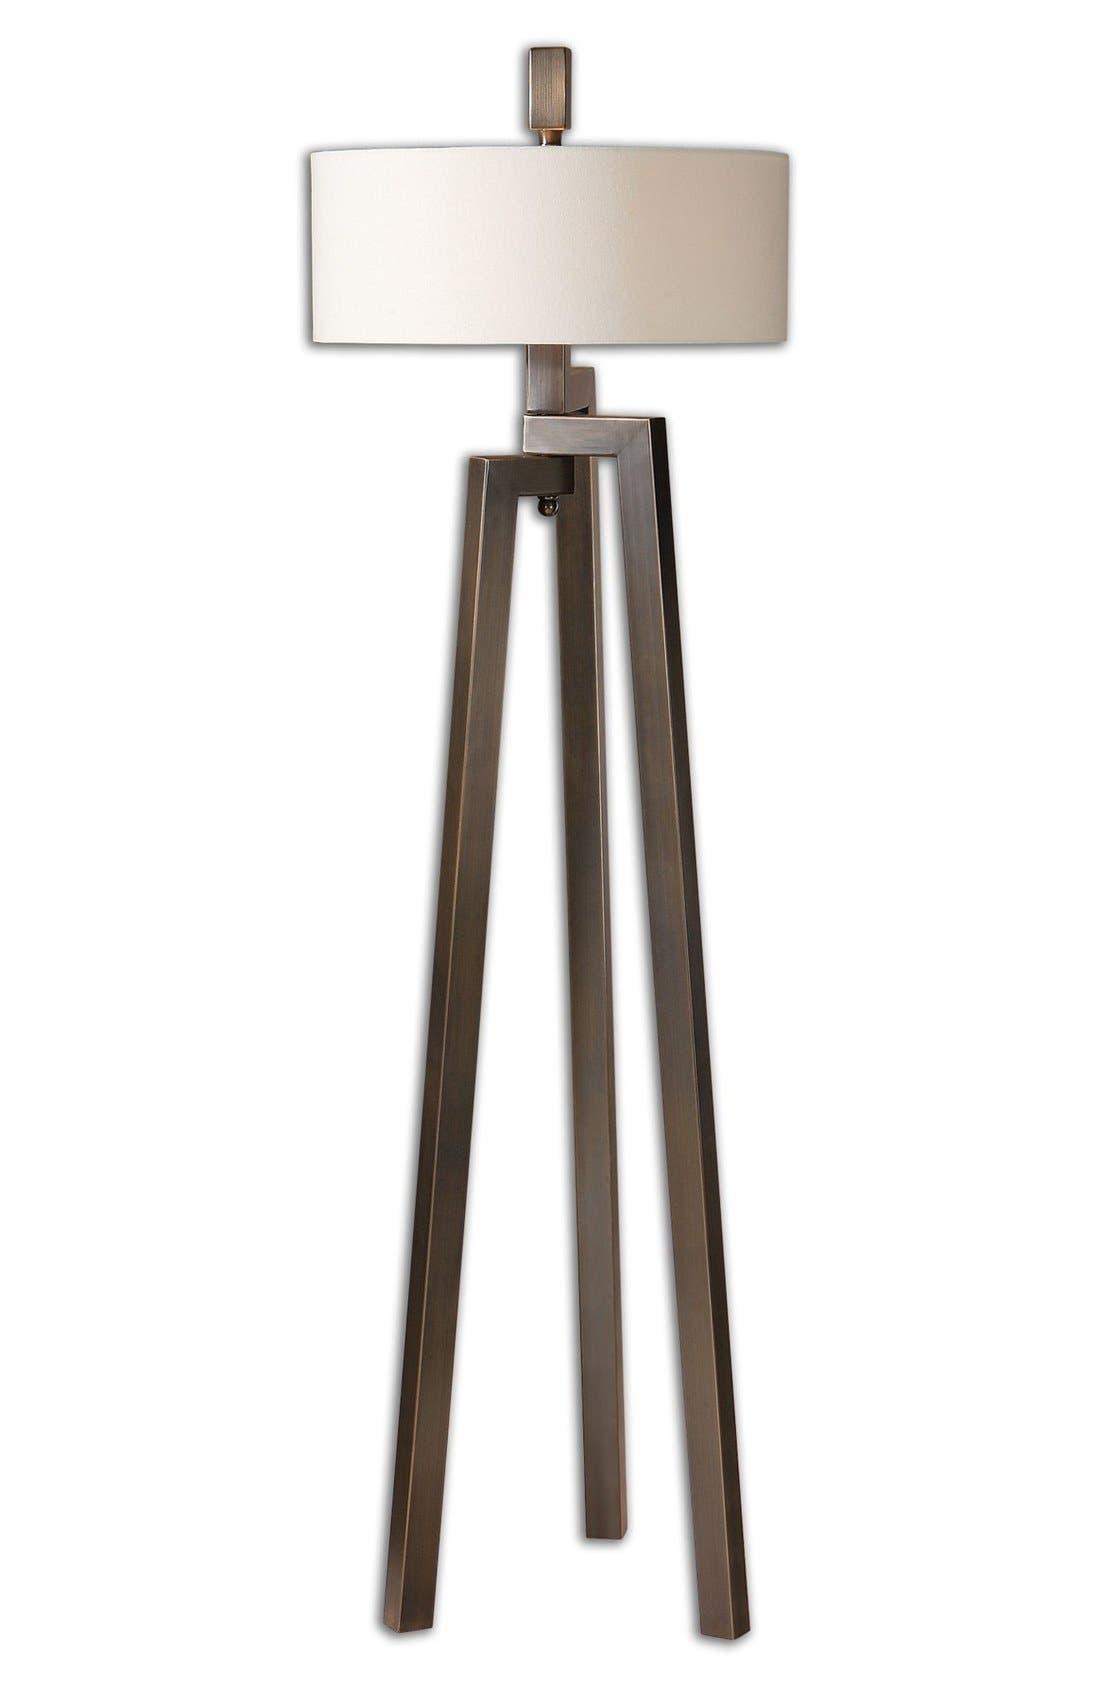 Alternate Image 1 Selected - Uttermost 'Mondovi' Hand Forged Metal Floor Lamp